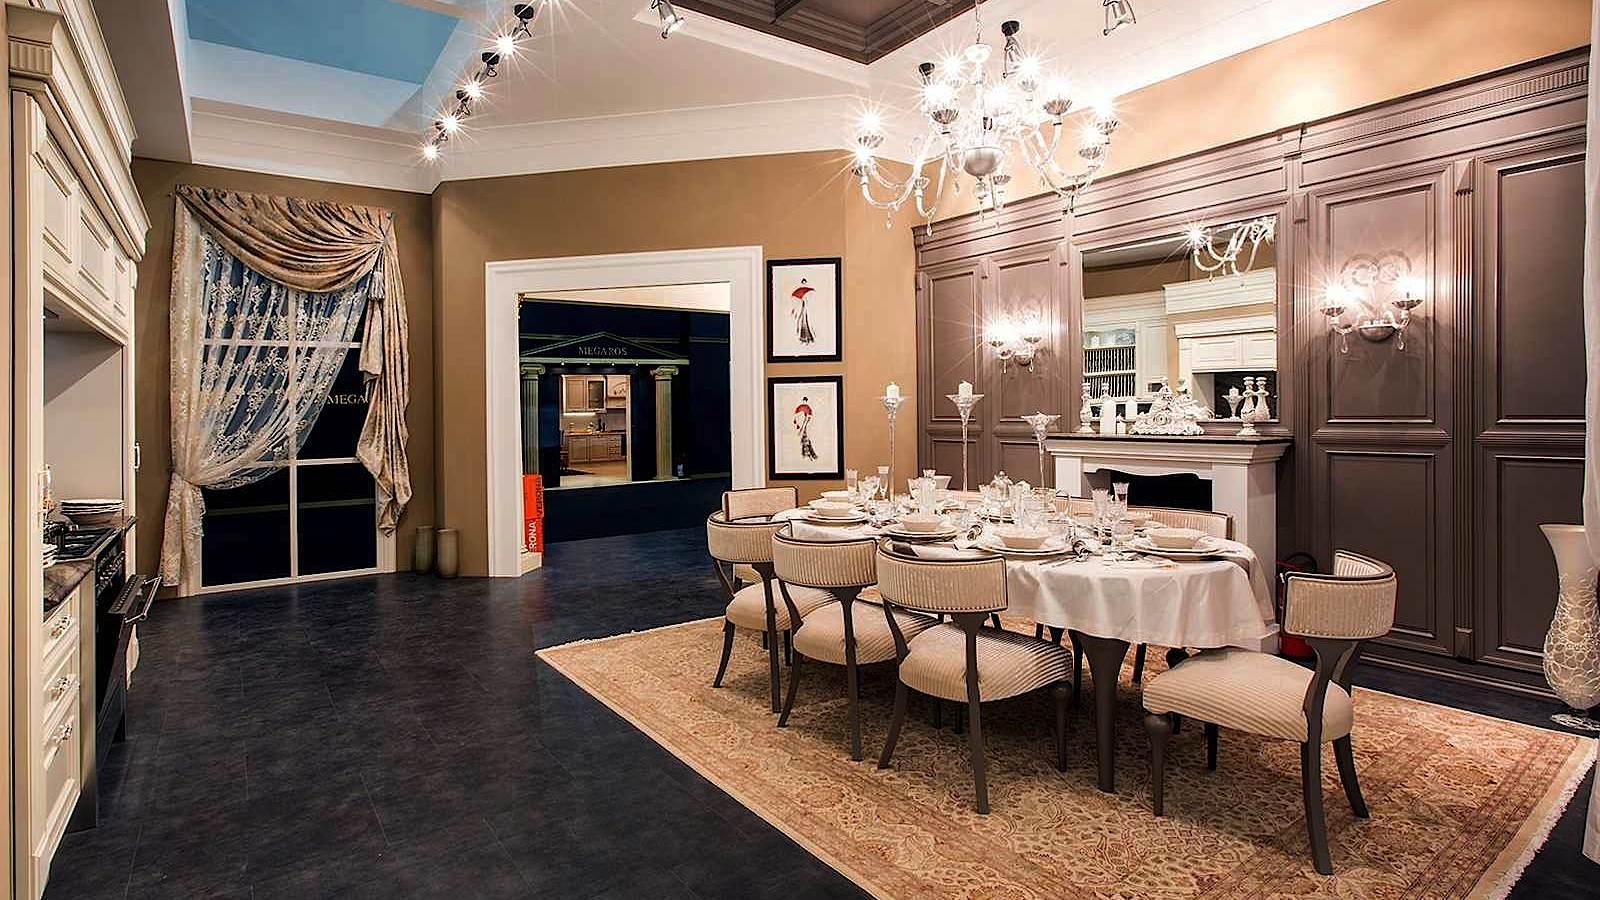 verona mobili salone del mobile 2014 milano bottega